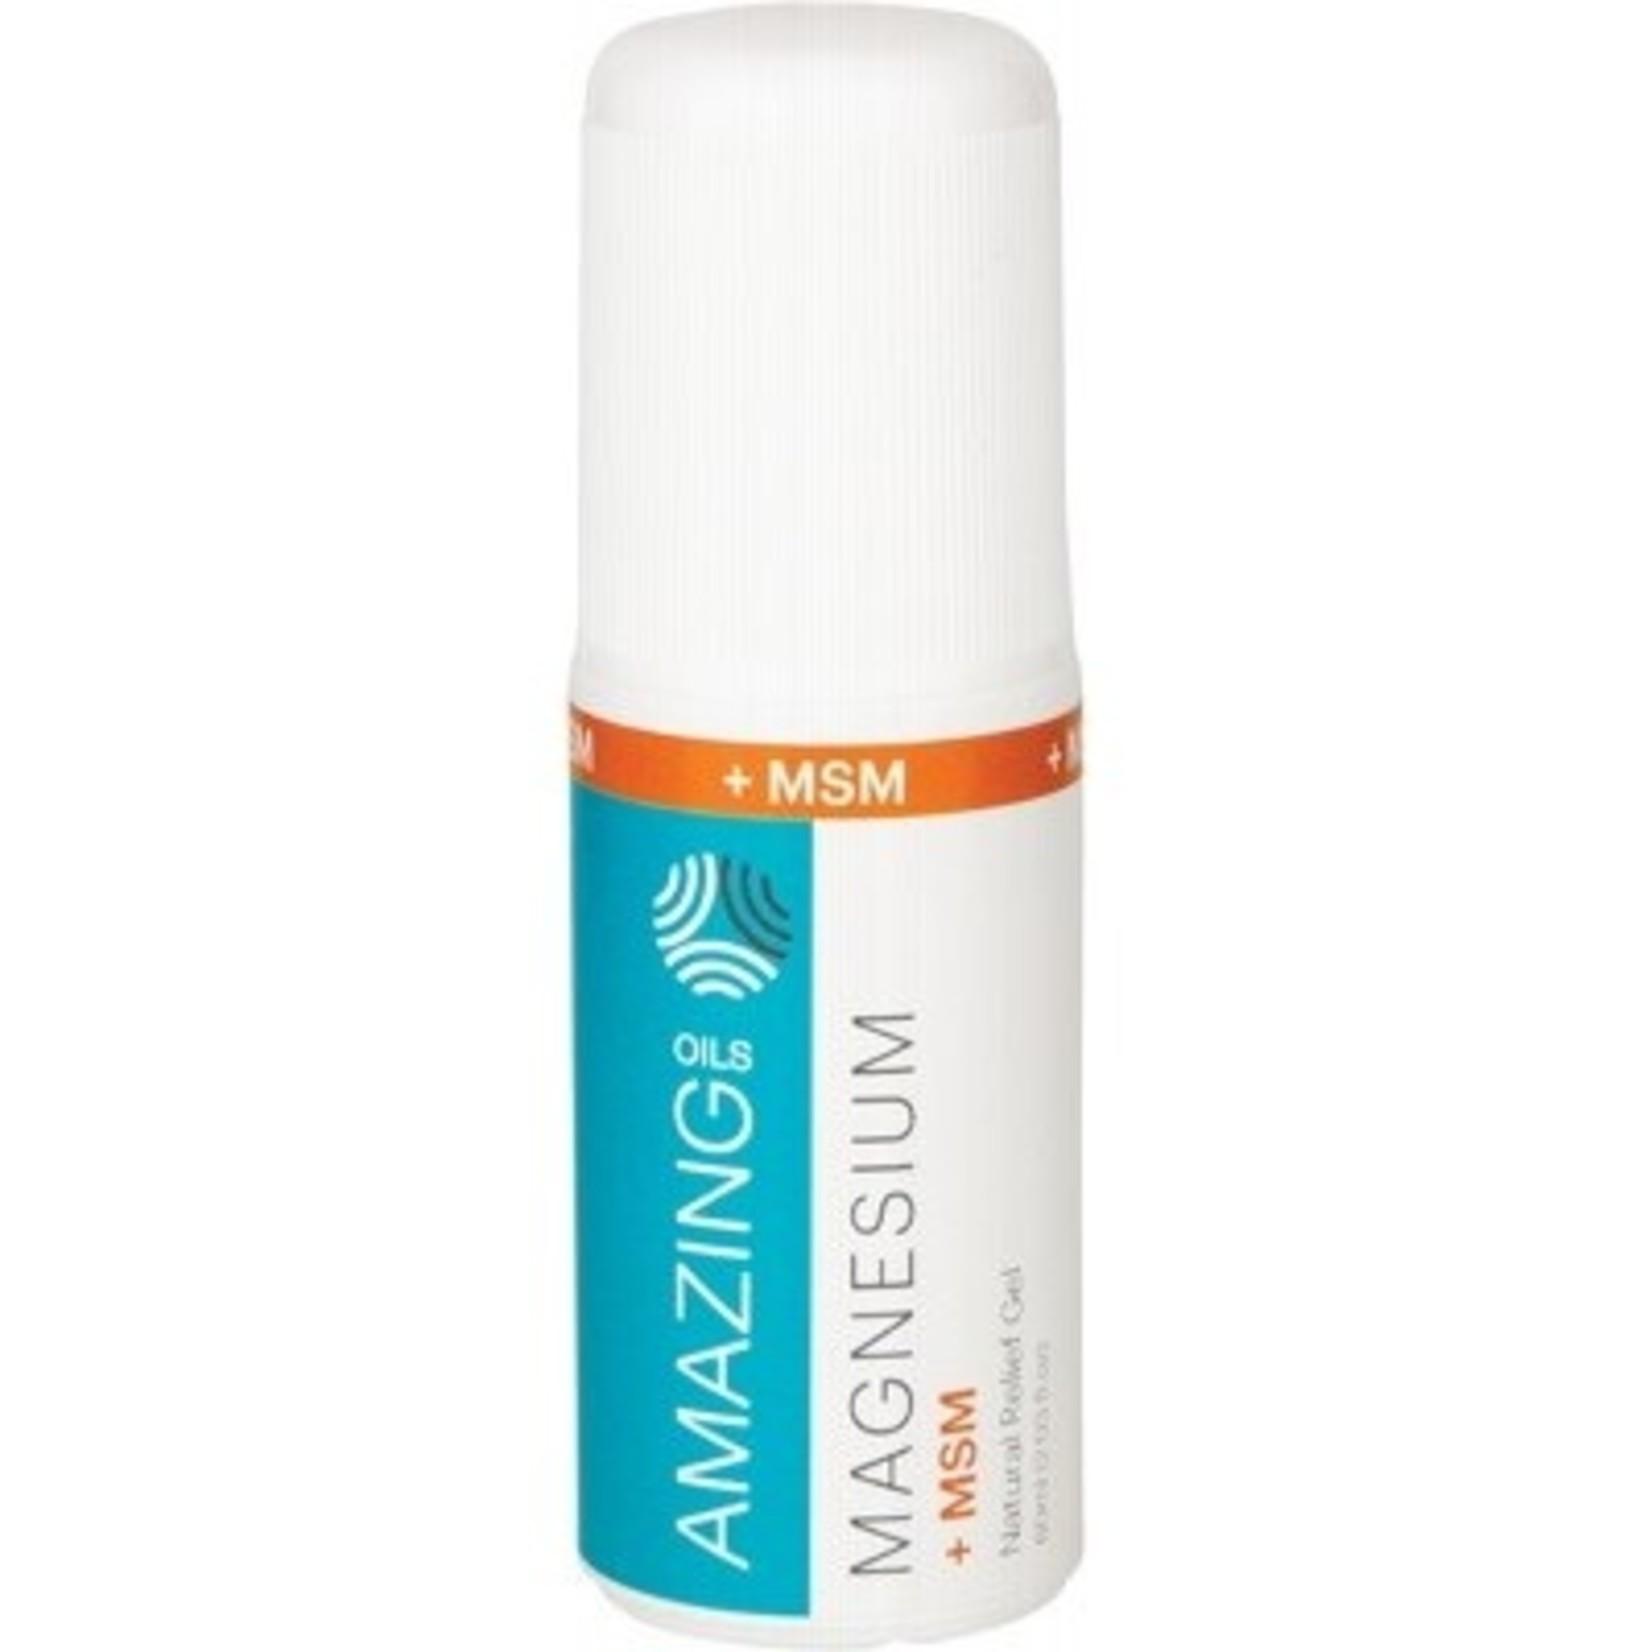 Magnesium + MSM roll on gel 60ml